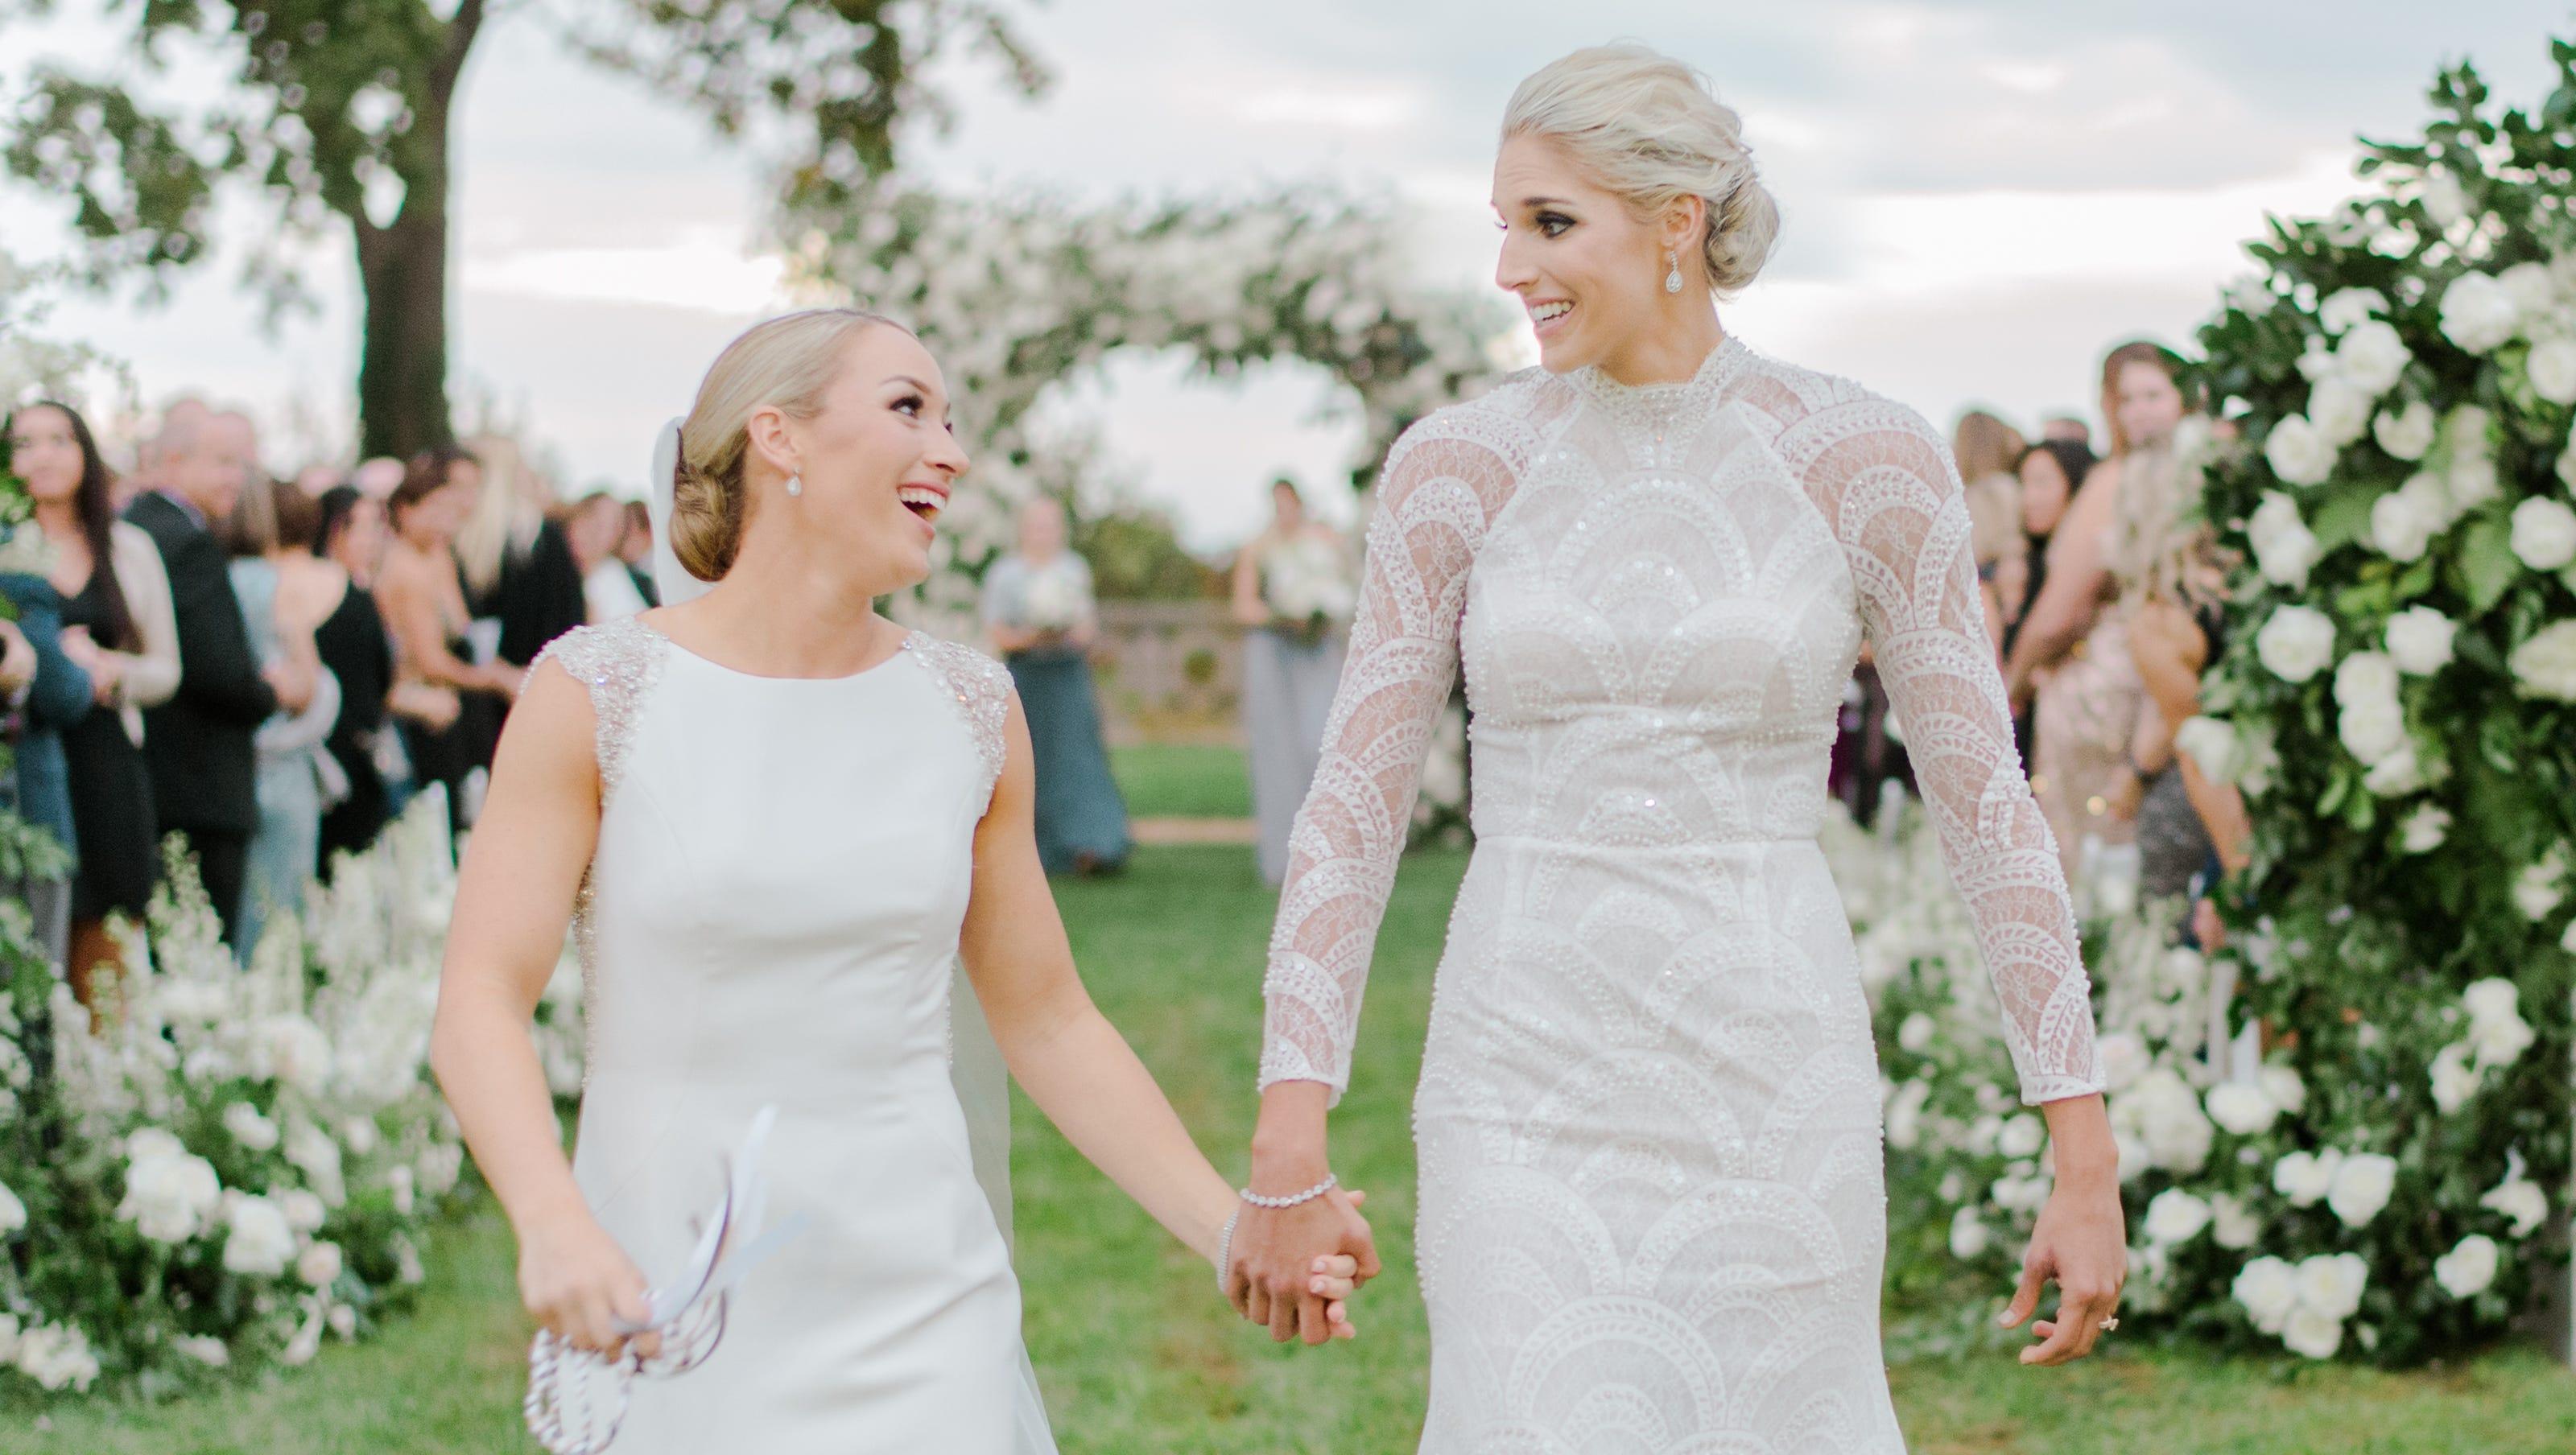 Elena Delle Donne, Amanda Clifton Marry In The Knot Dream